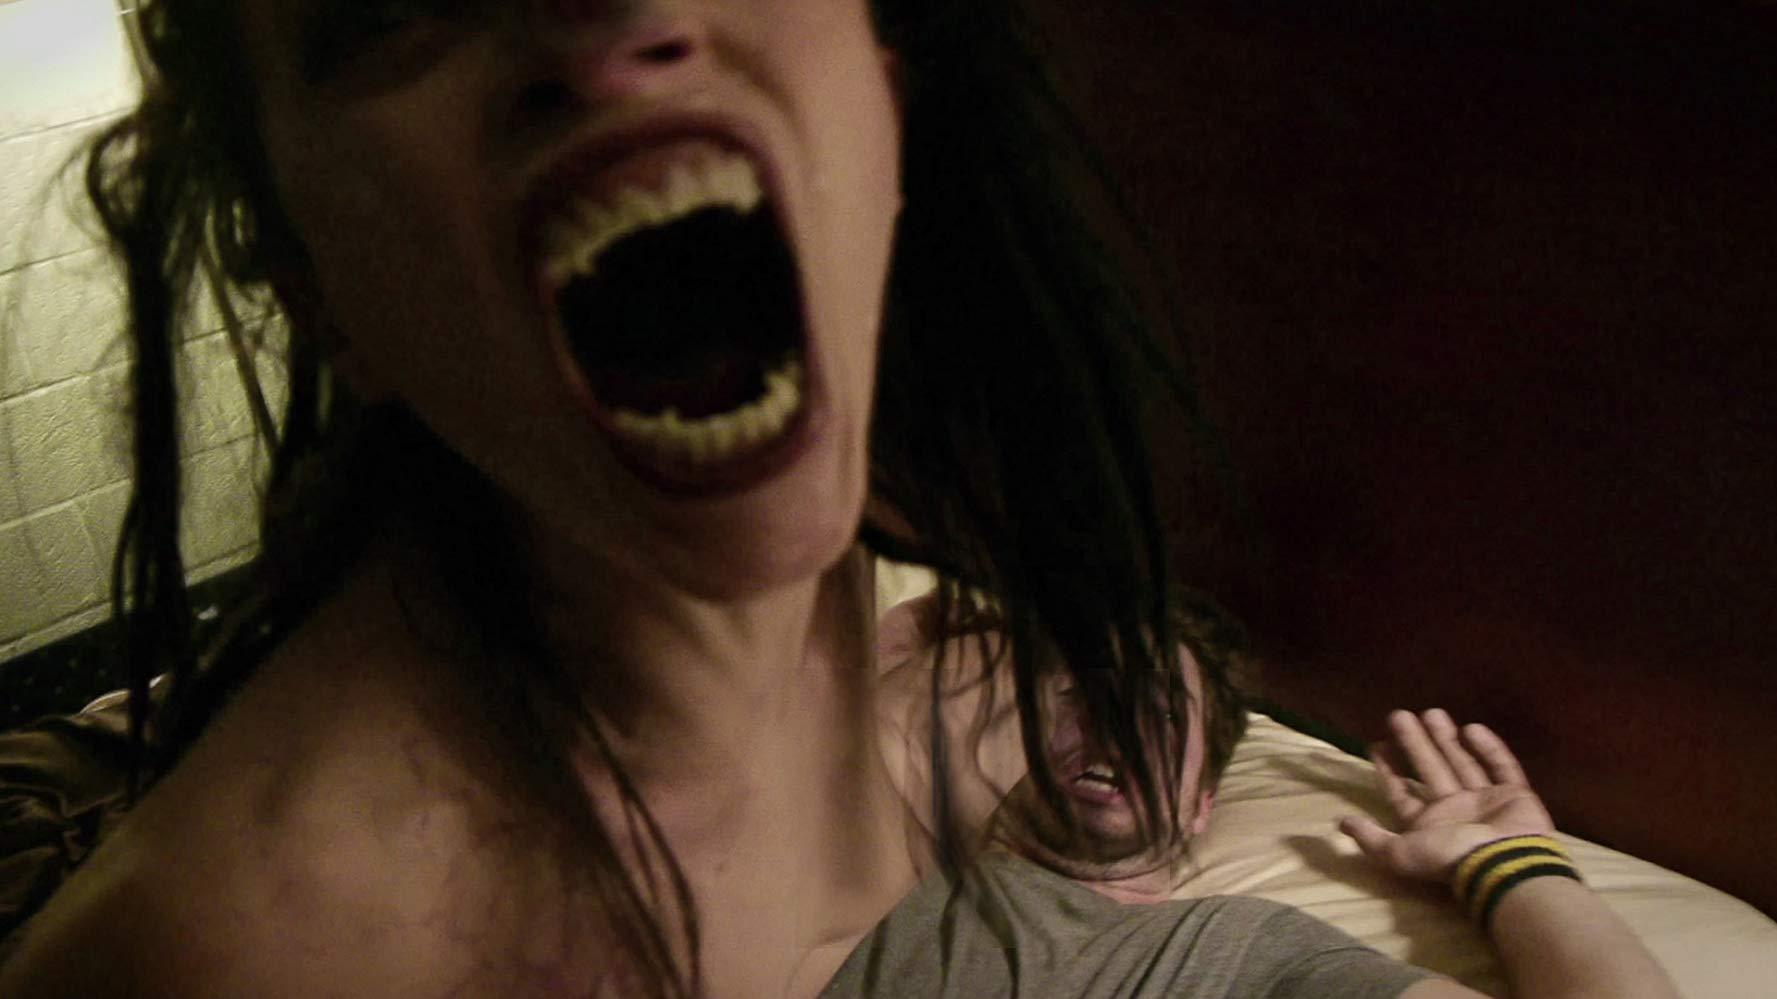 Filmmaker David Bruckner Joins the Fun on 'Movie Crypt'